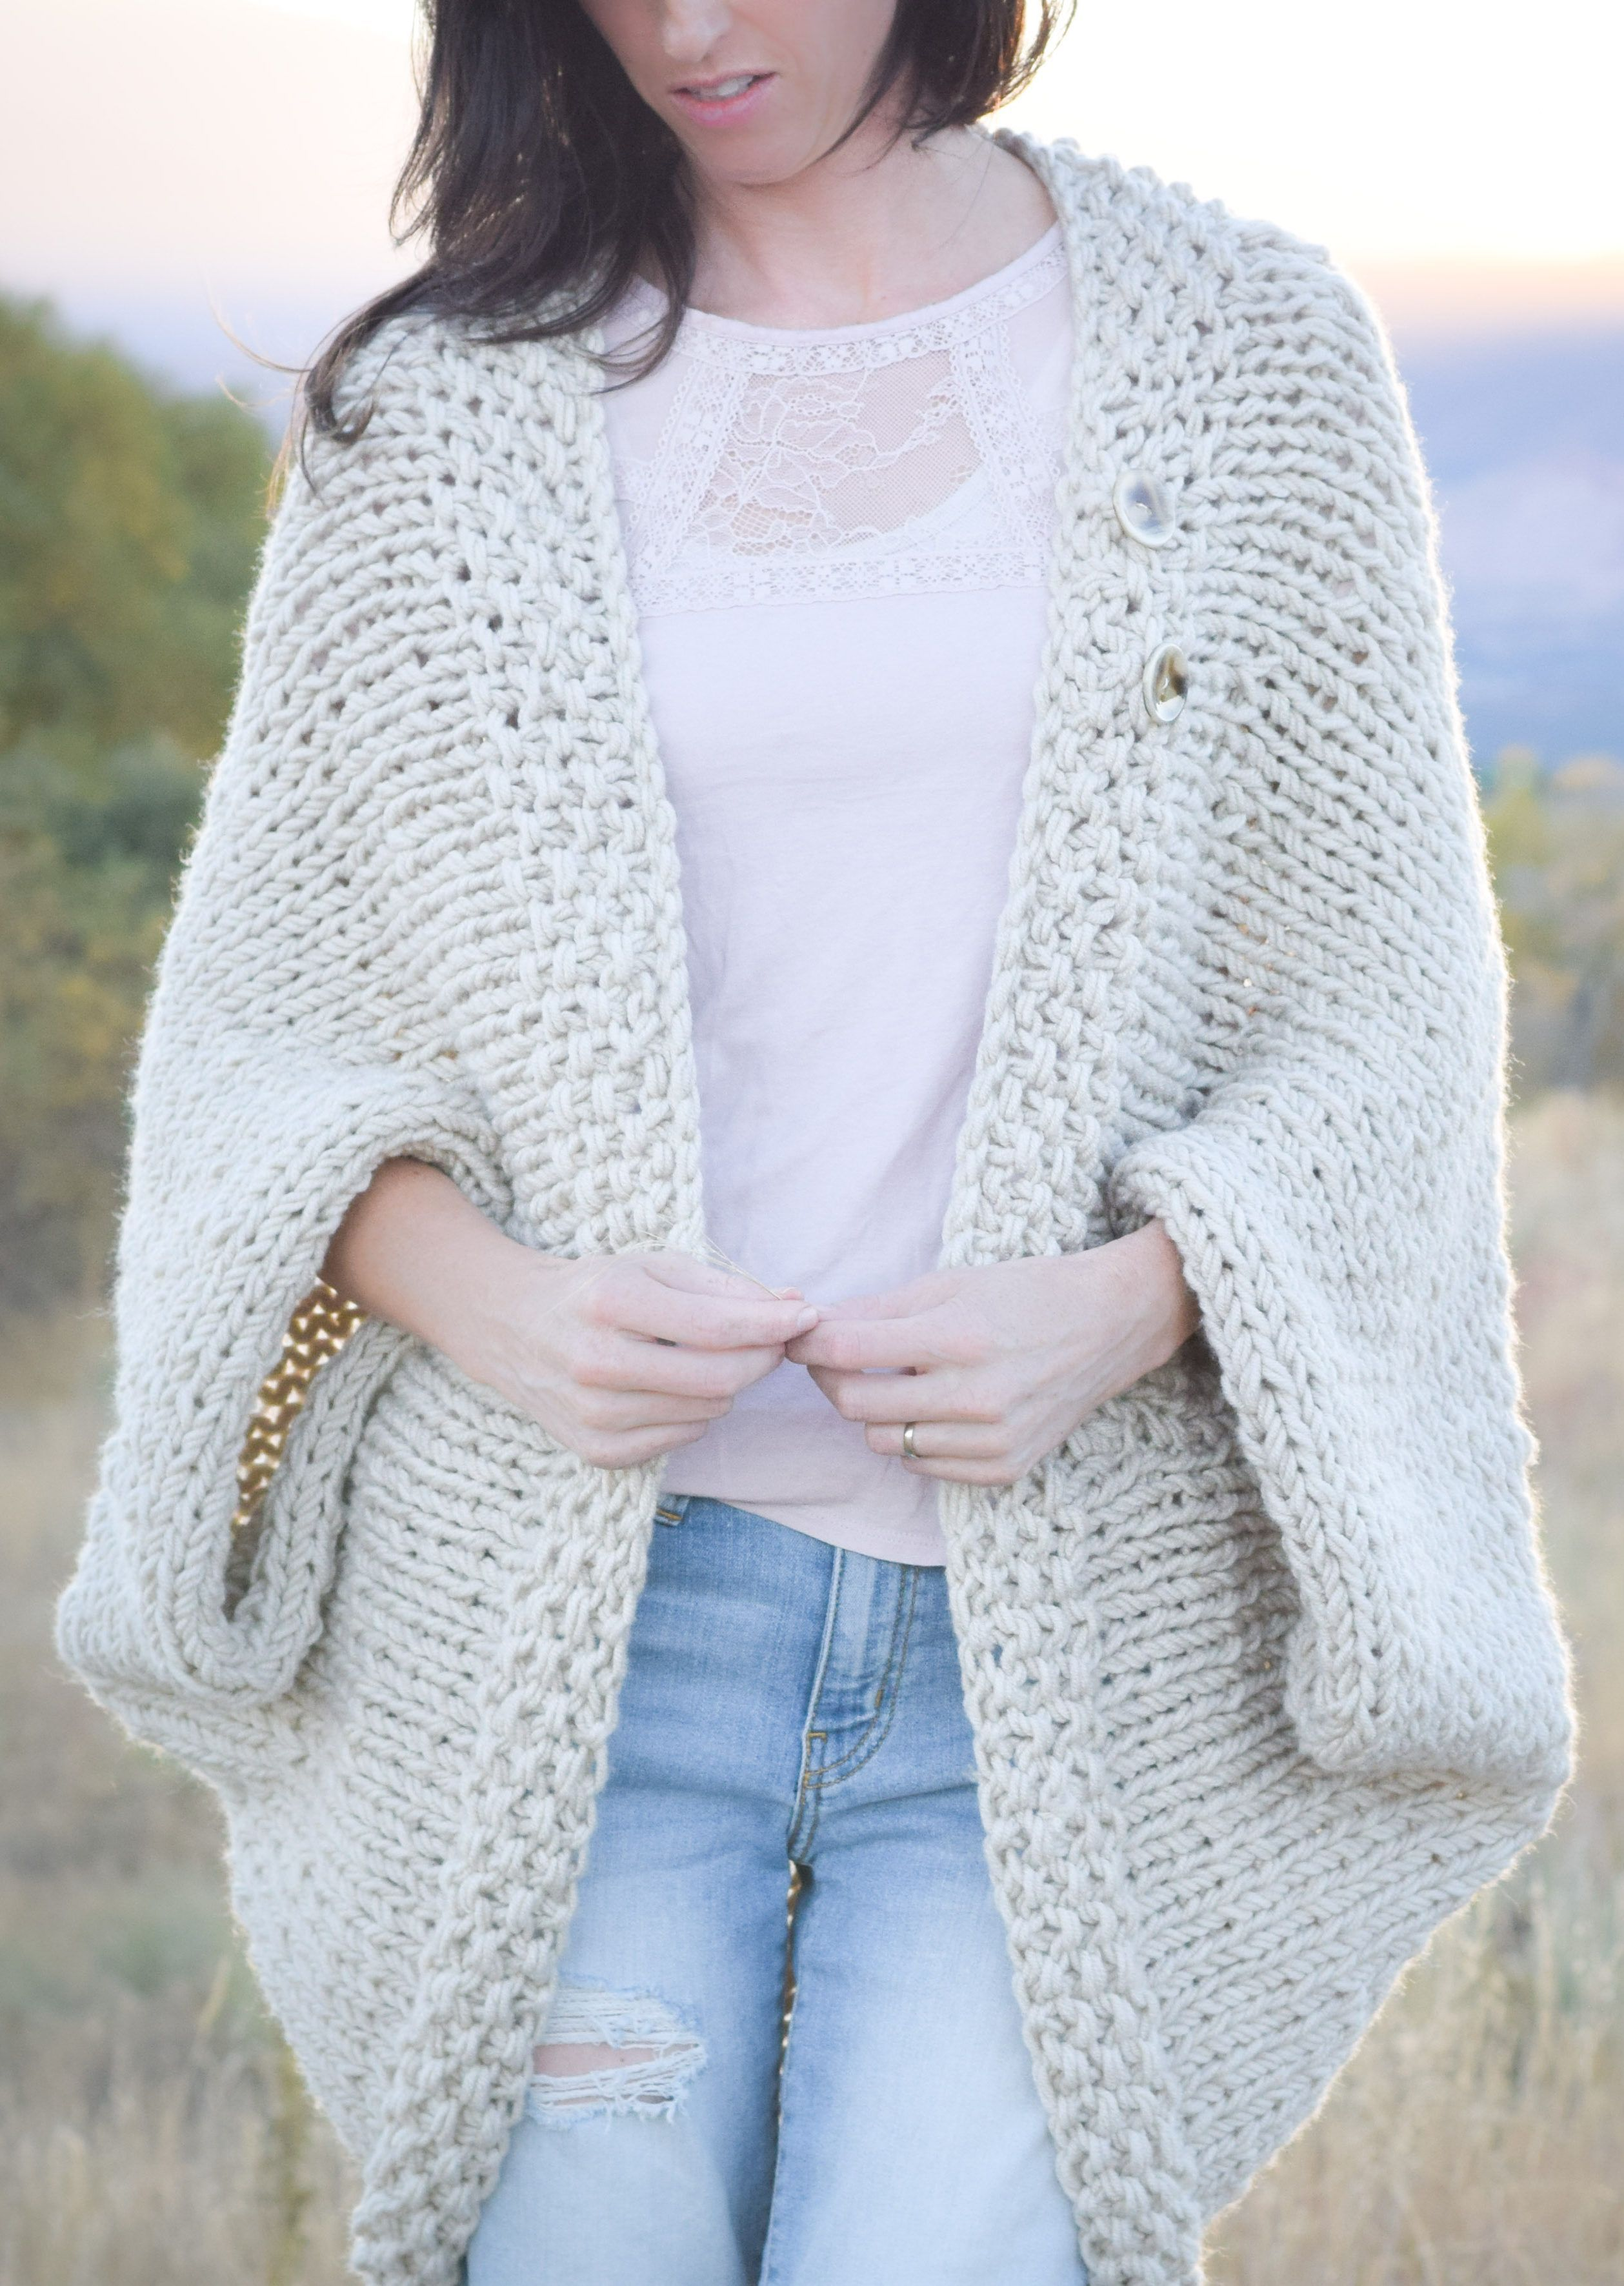 Easy Cardigan Knitting Patterns | Crochet | Pinterest | Knitting ...